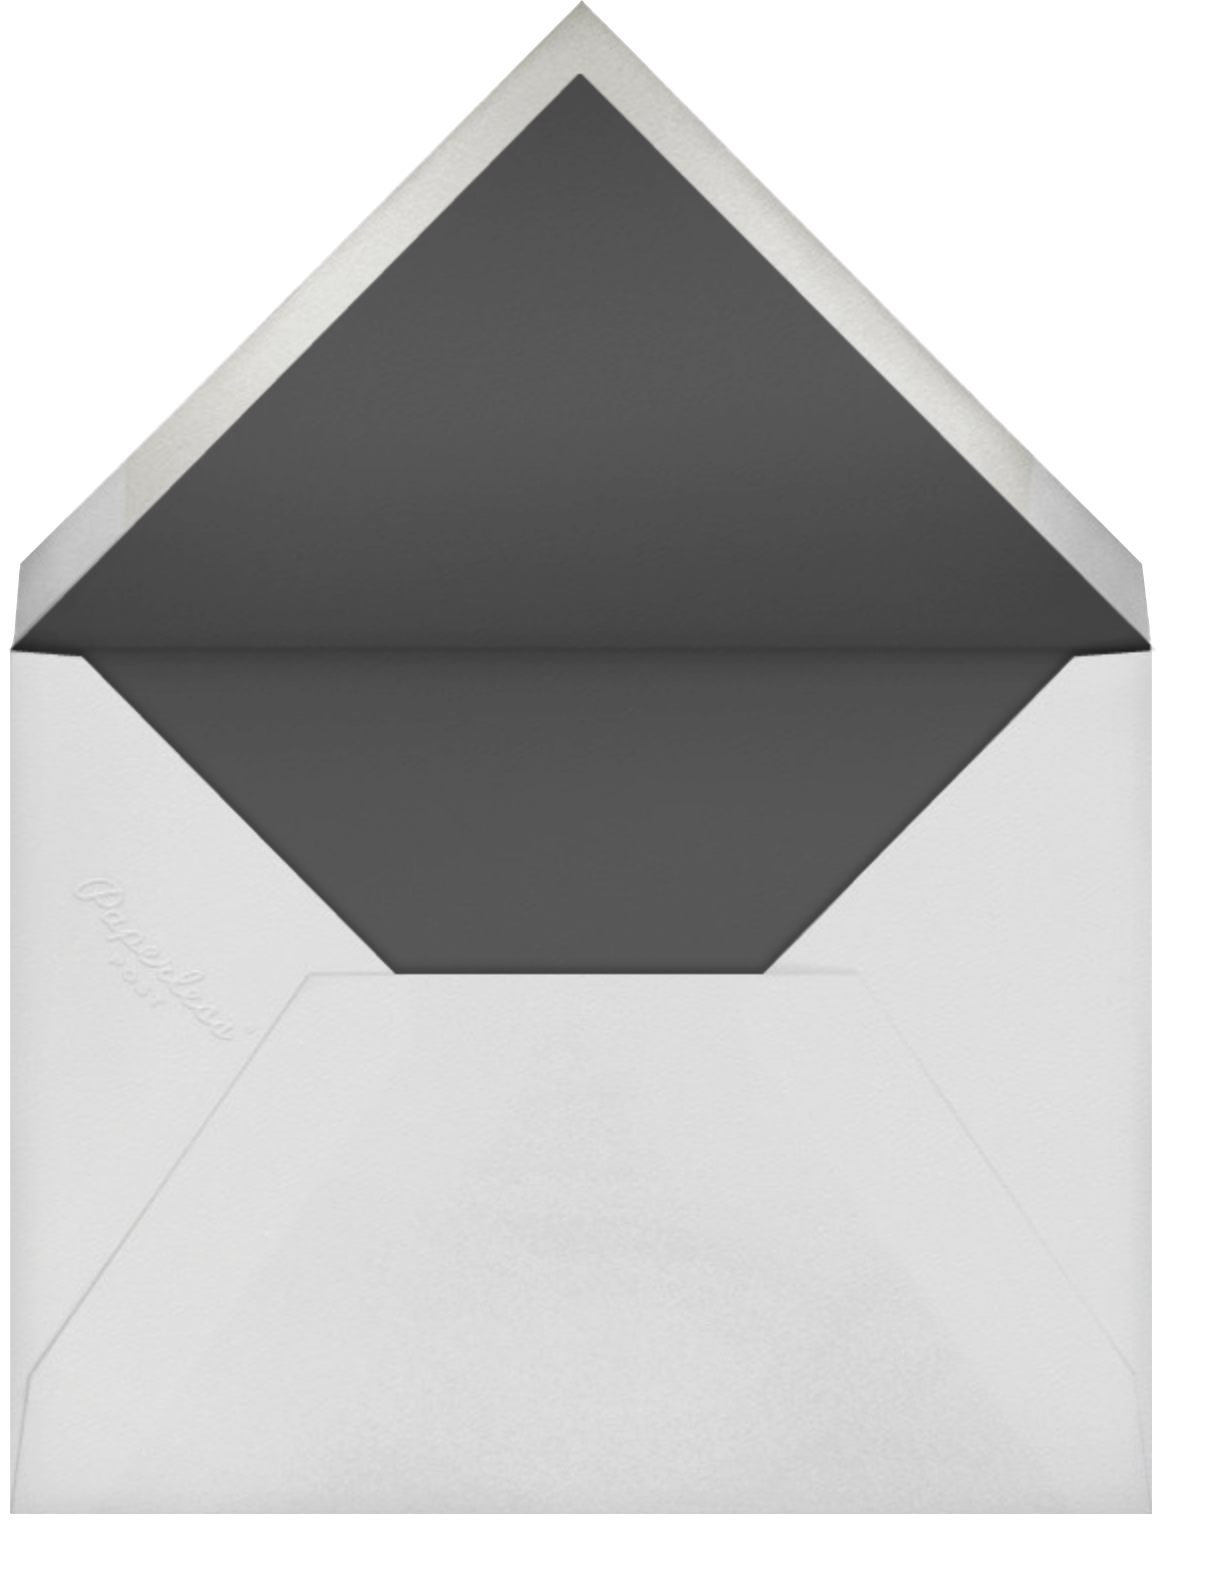 Ellis Hall I (Invitation) - kate spade new york - All - envelope back